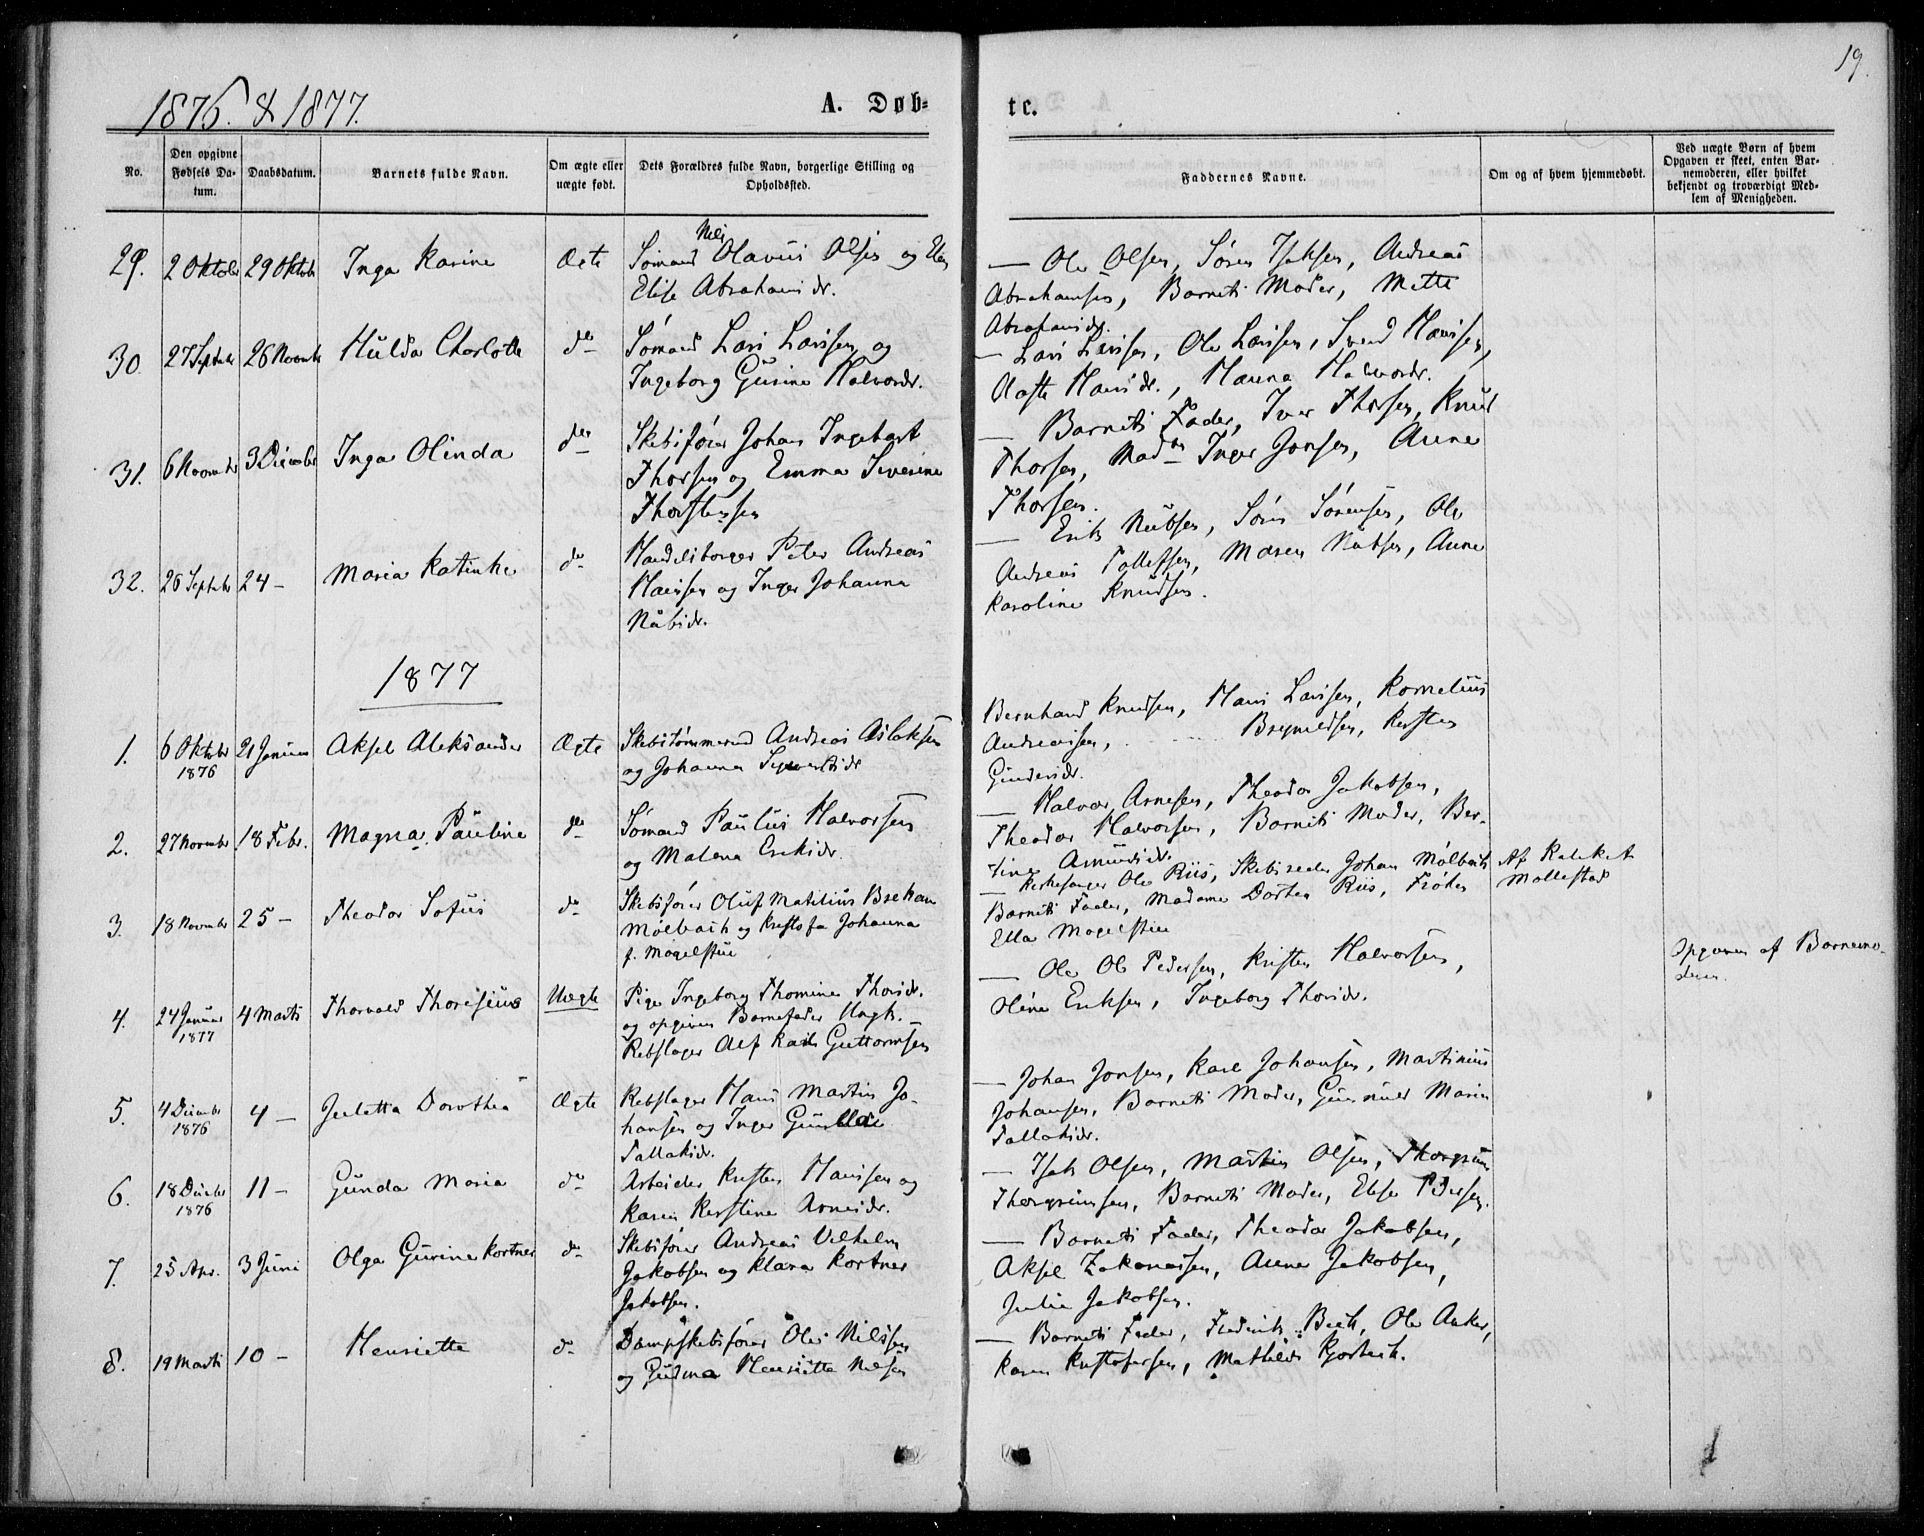 SAKO, Langesund kirkebøker, F/Fa/L0001: Ministerialbok nr. 1, 1870-1877, s. 19